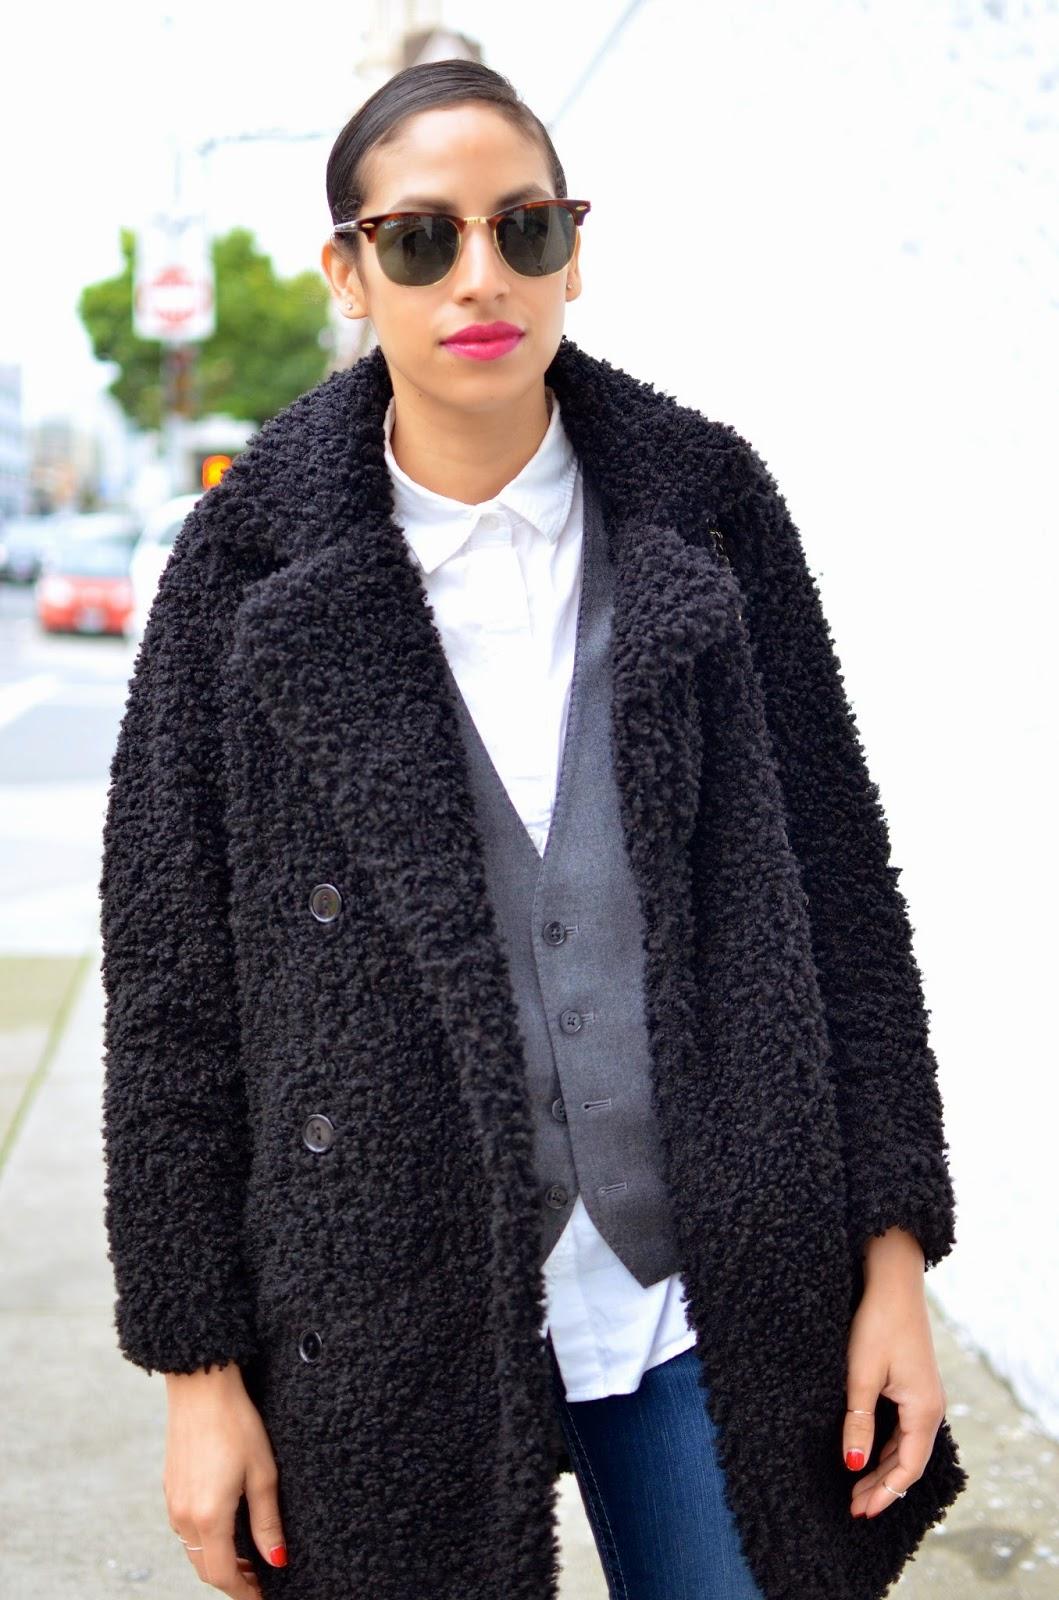 OOTD, denim, True Religion denim, Missguided, black furry coat, menswear trend, Chanel lipgloss, San Francisco style